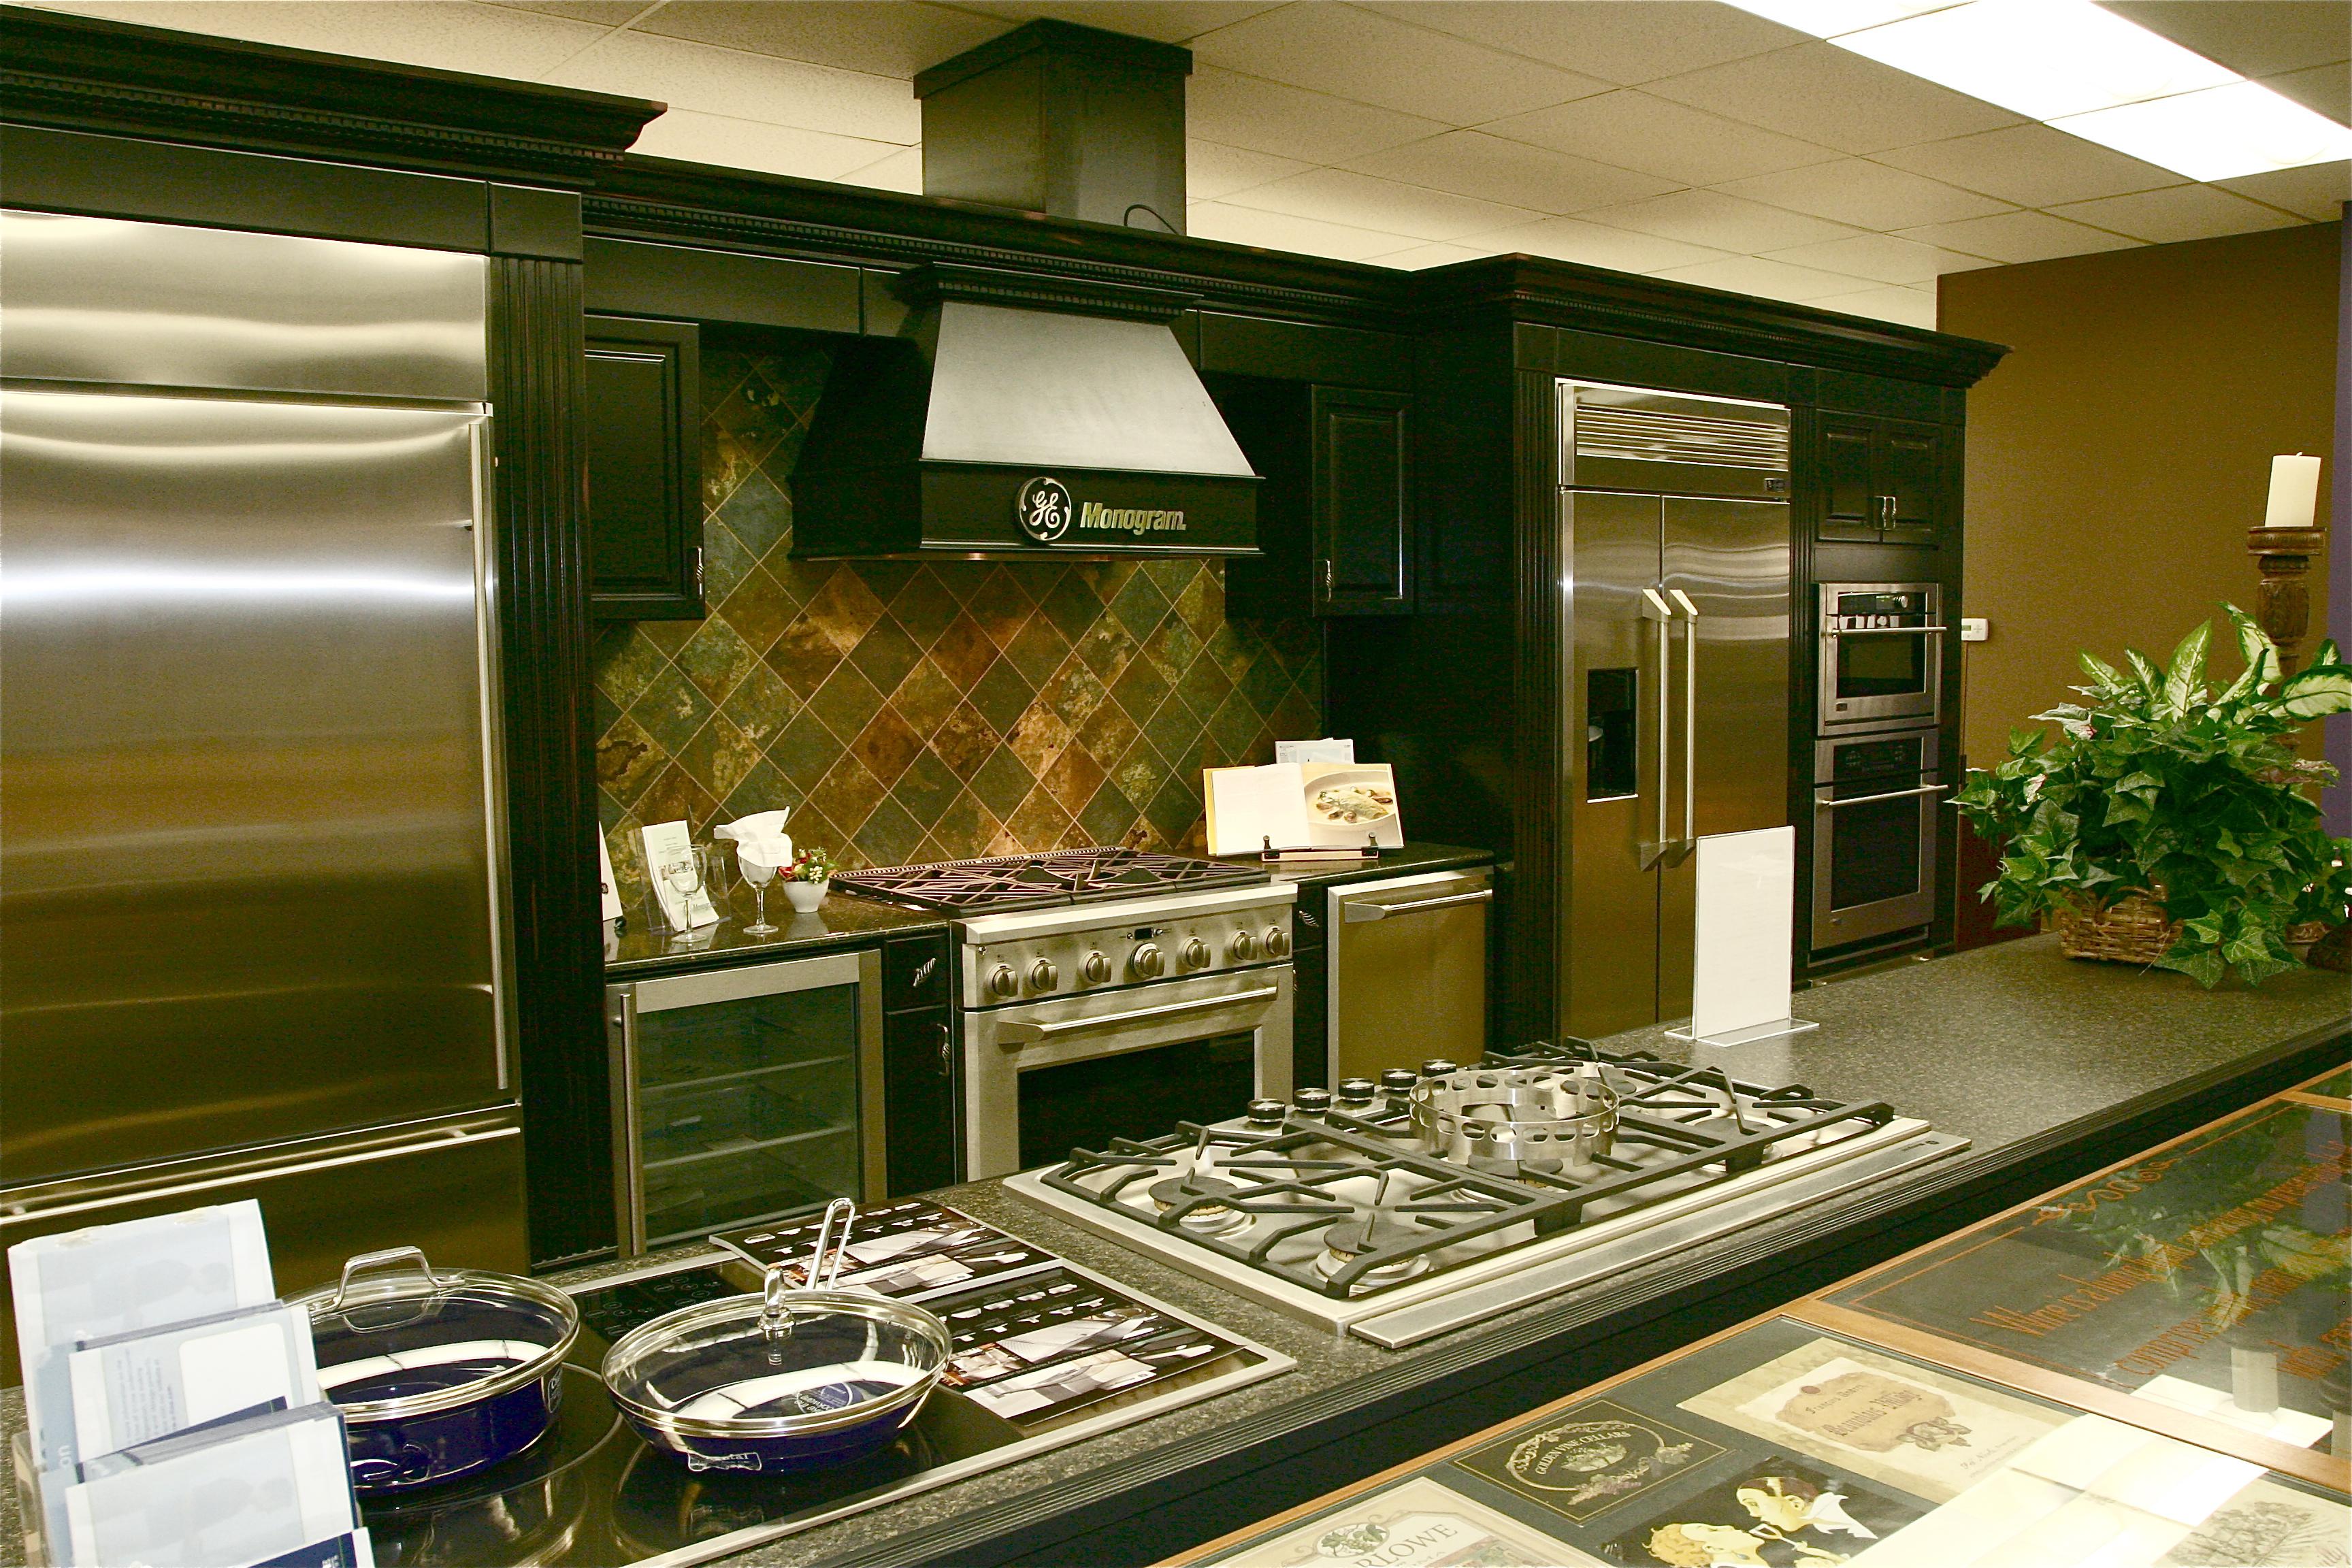 Kitchen appliance warehouse Photo - 10